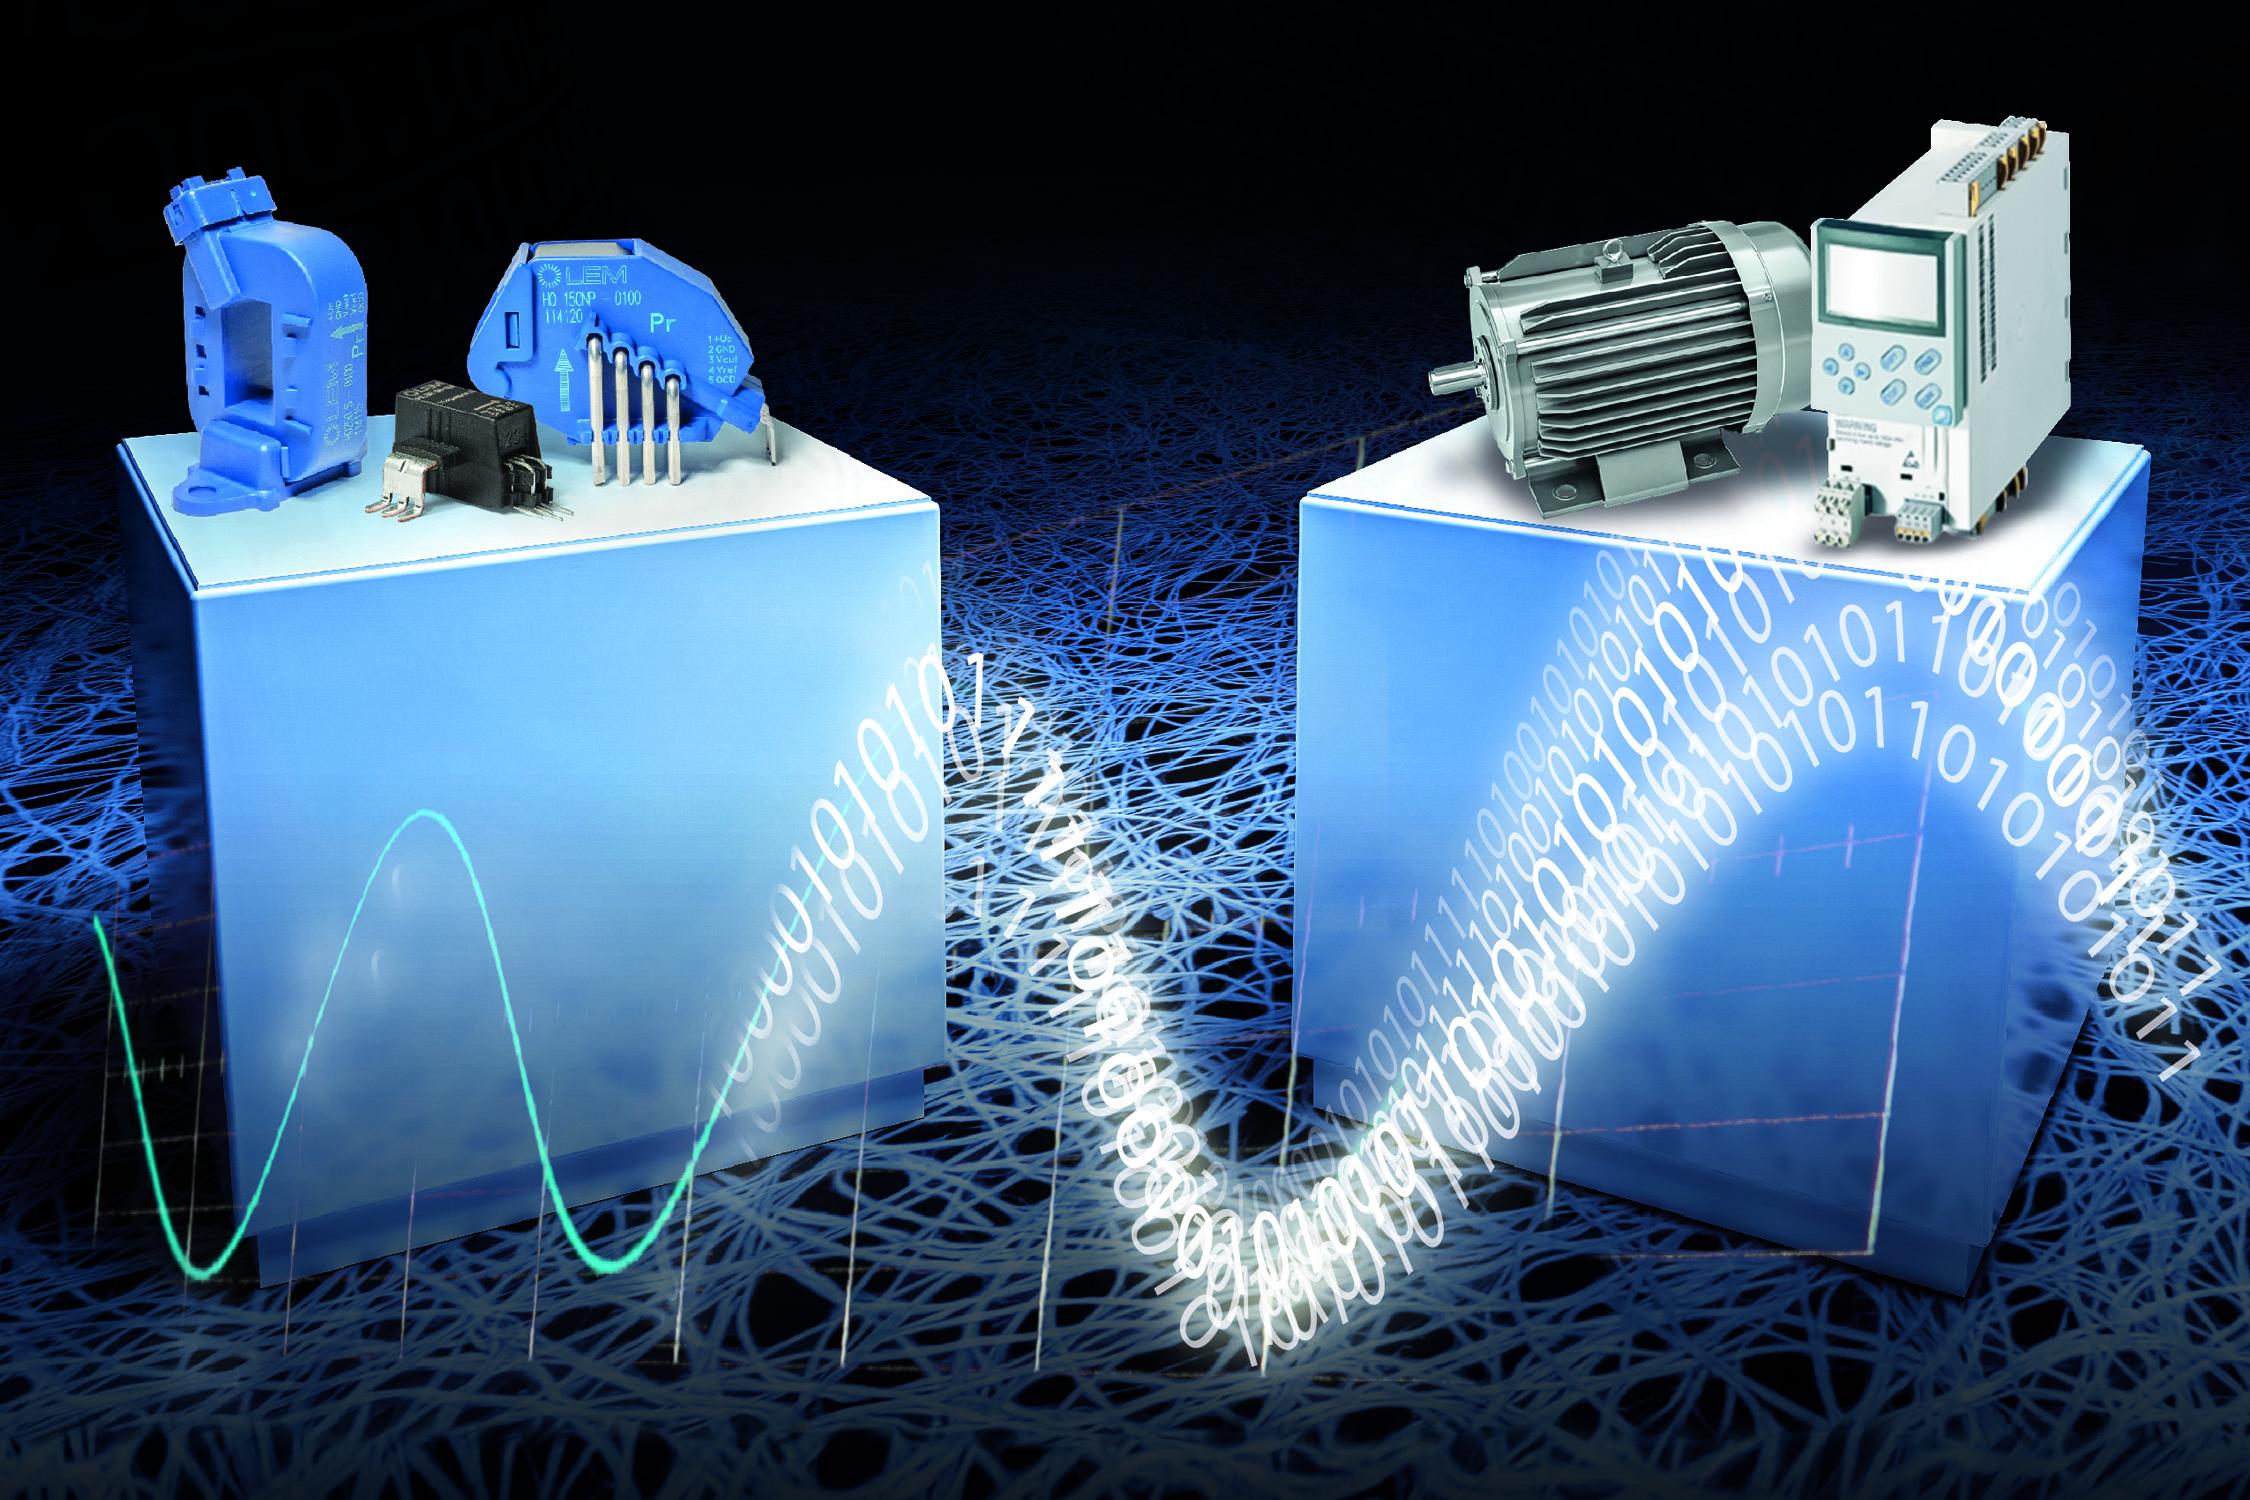 Digital transducers